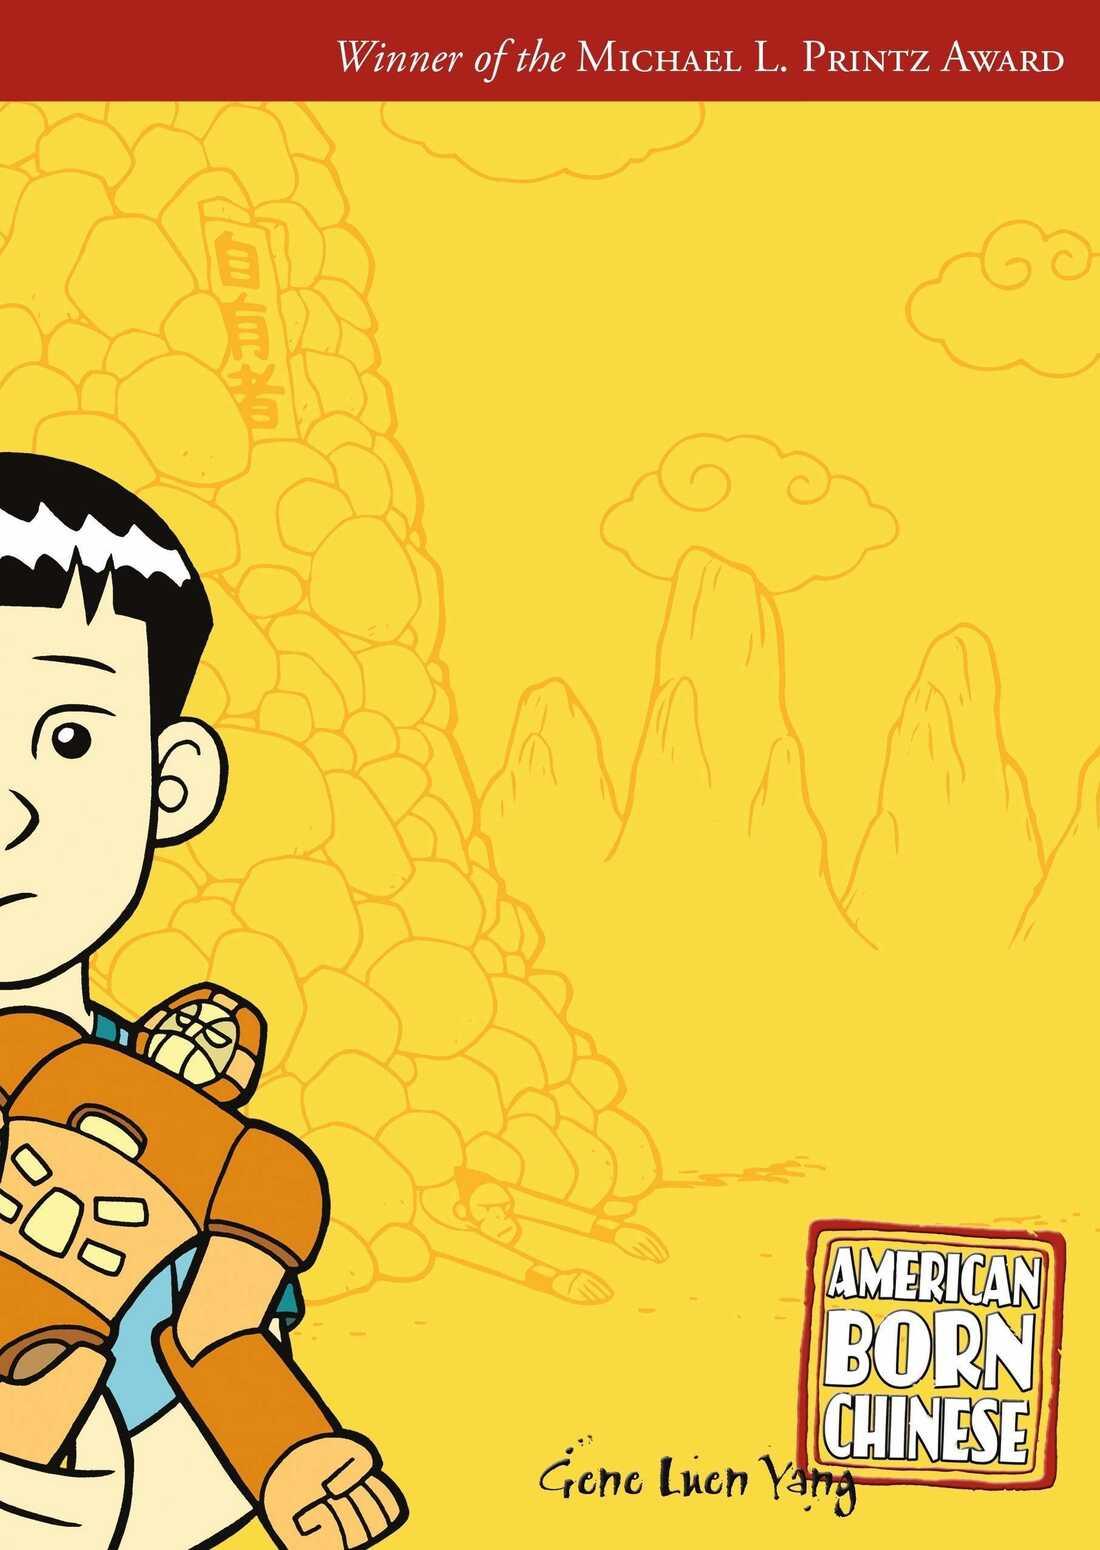 American-Born Chinese, by Gene Luen Yang